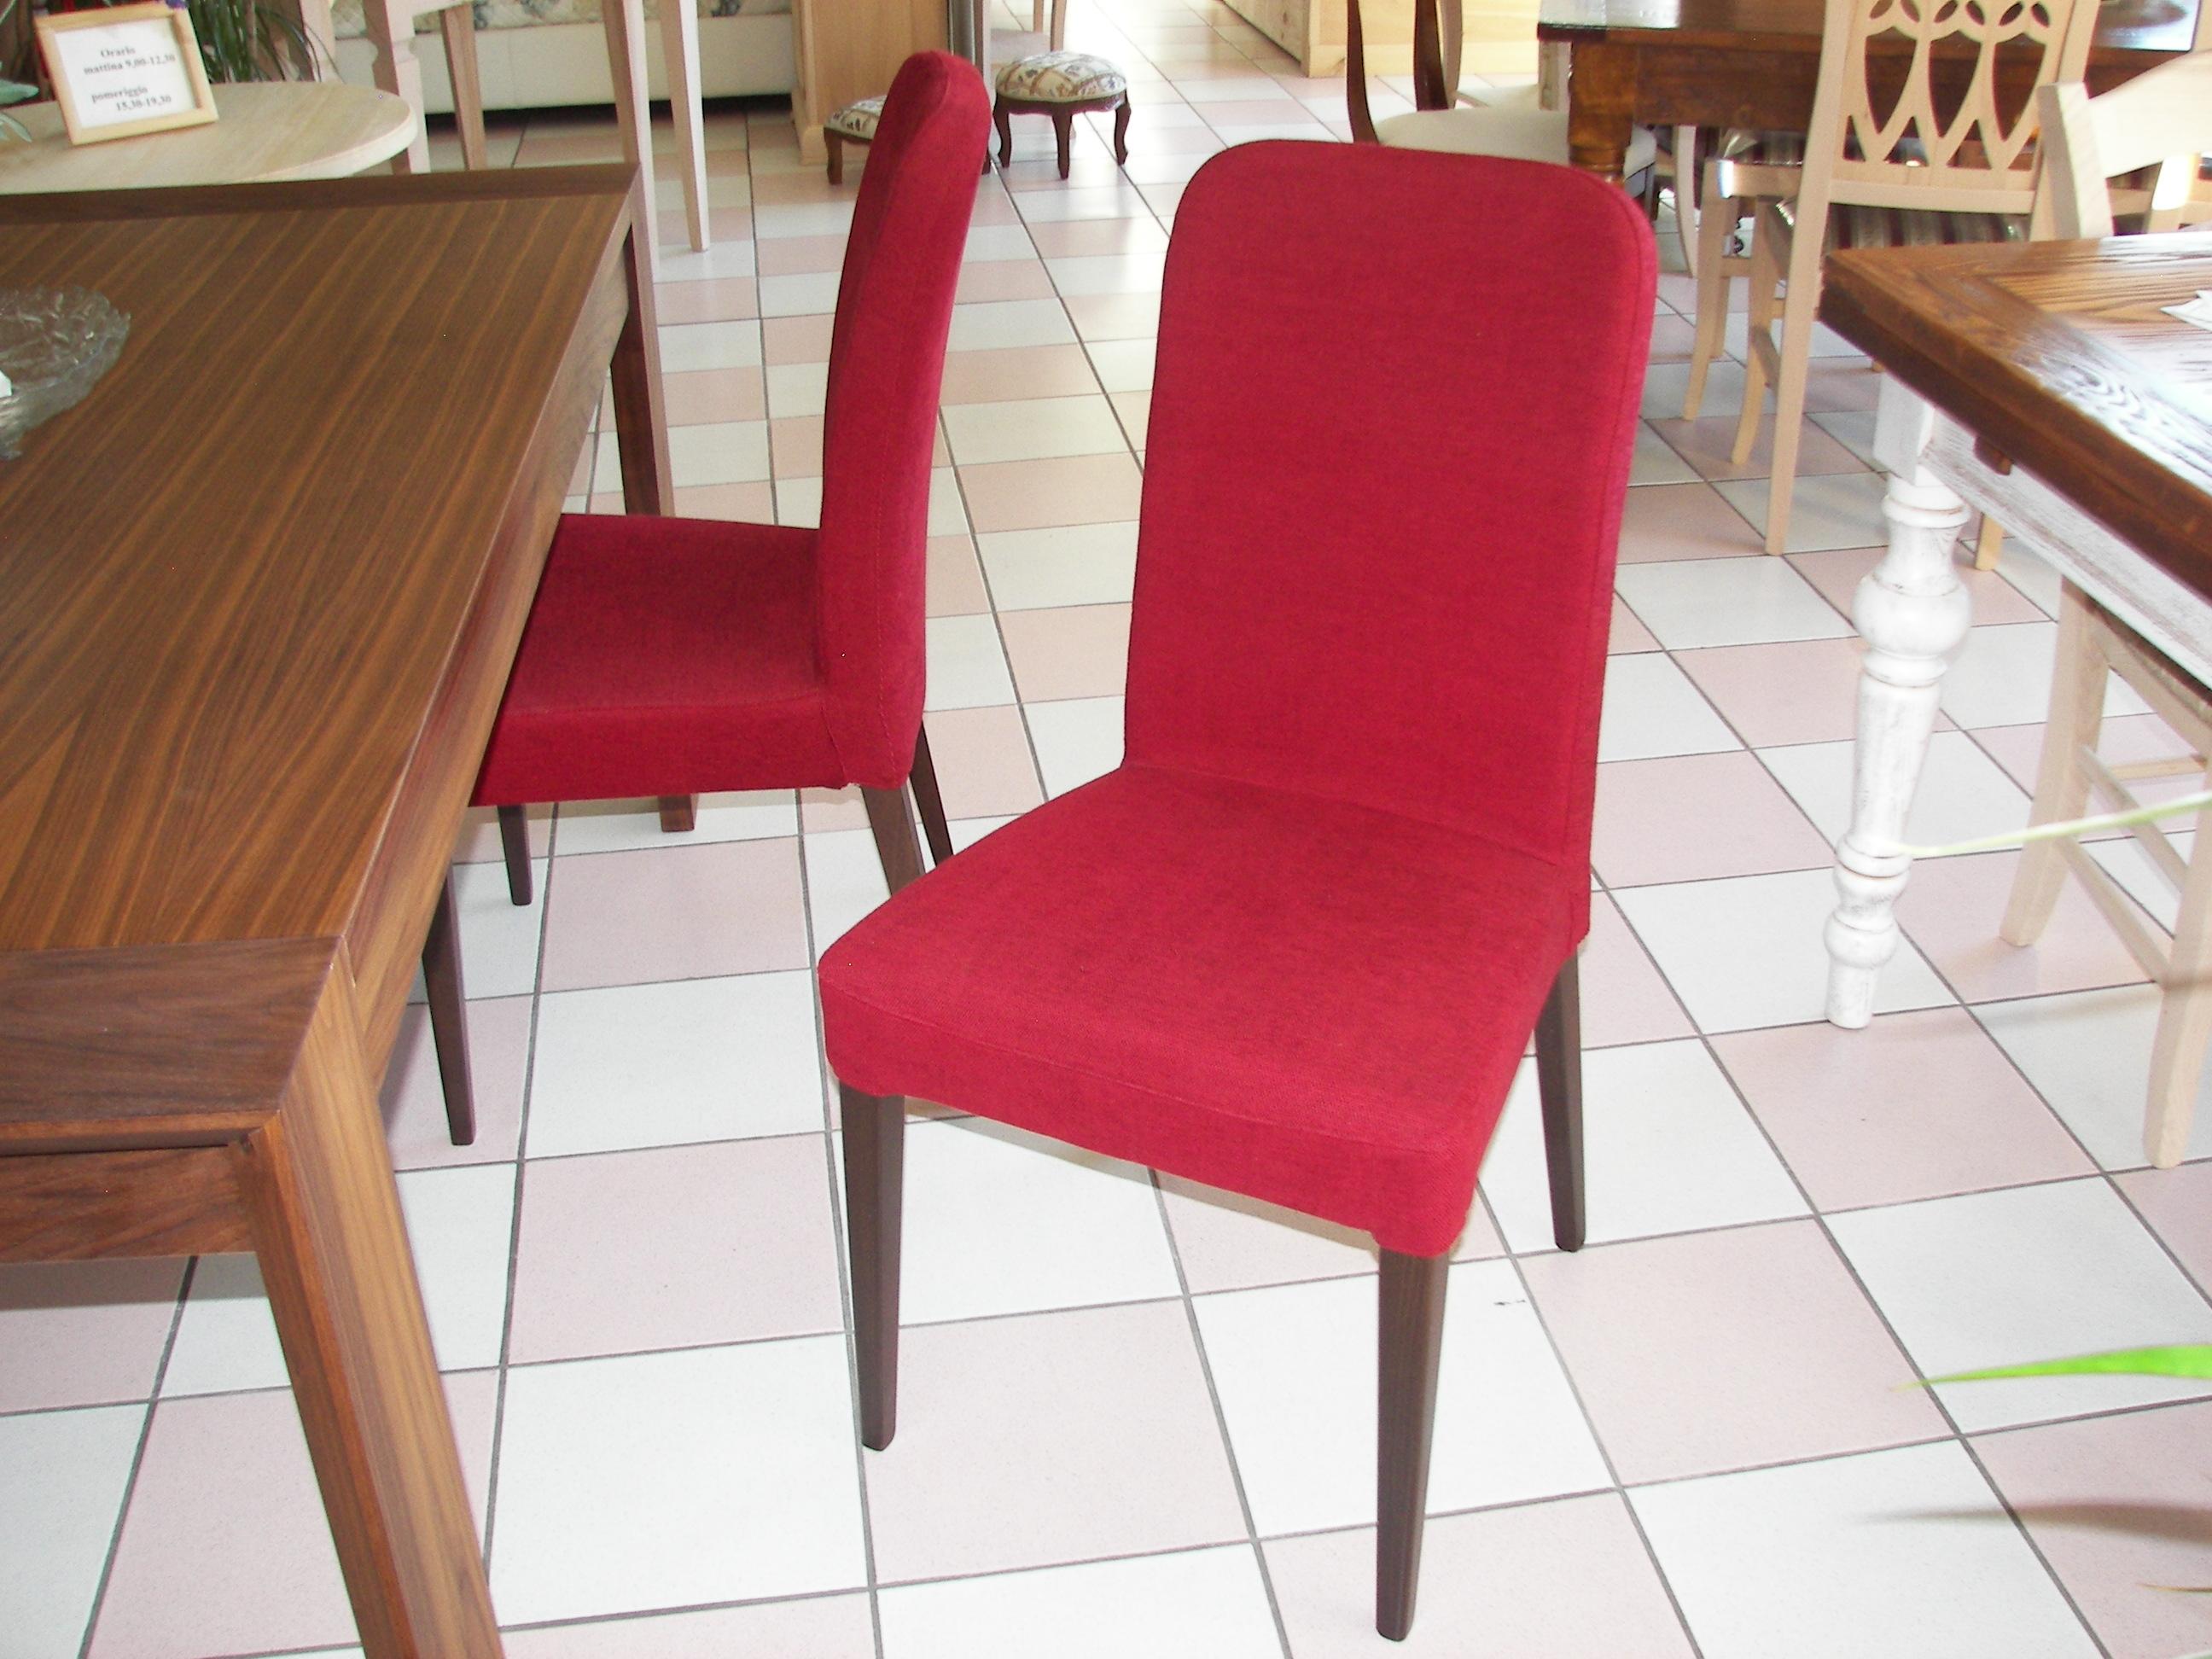 Sedia Calligaris Rossa.Sedie Cucina Ikea Da Economiche Prezzi Sedia Offerte Sedie